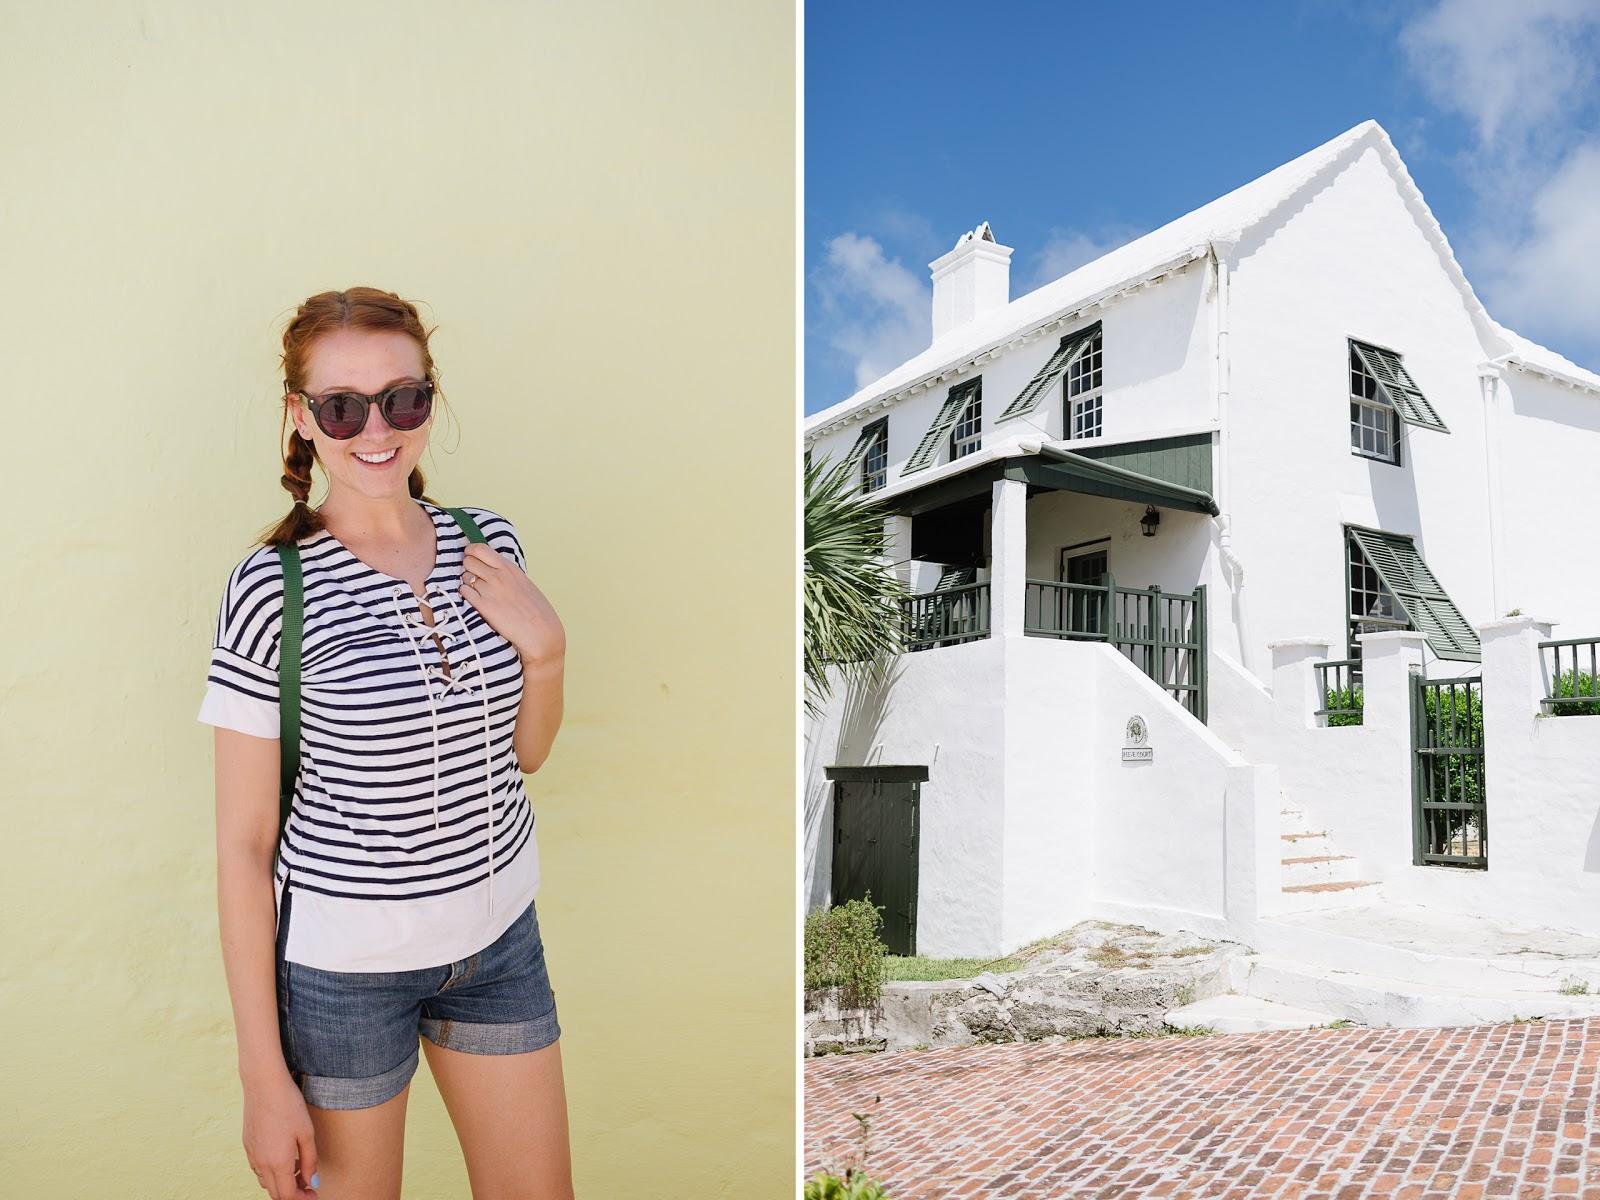 Bermuda-family portraits-vacation-2016-bermudas-photography-travel-travel blogger-beautyosaurus lex-Alex Good-island-St. George Bermuda